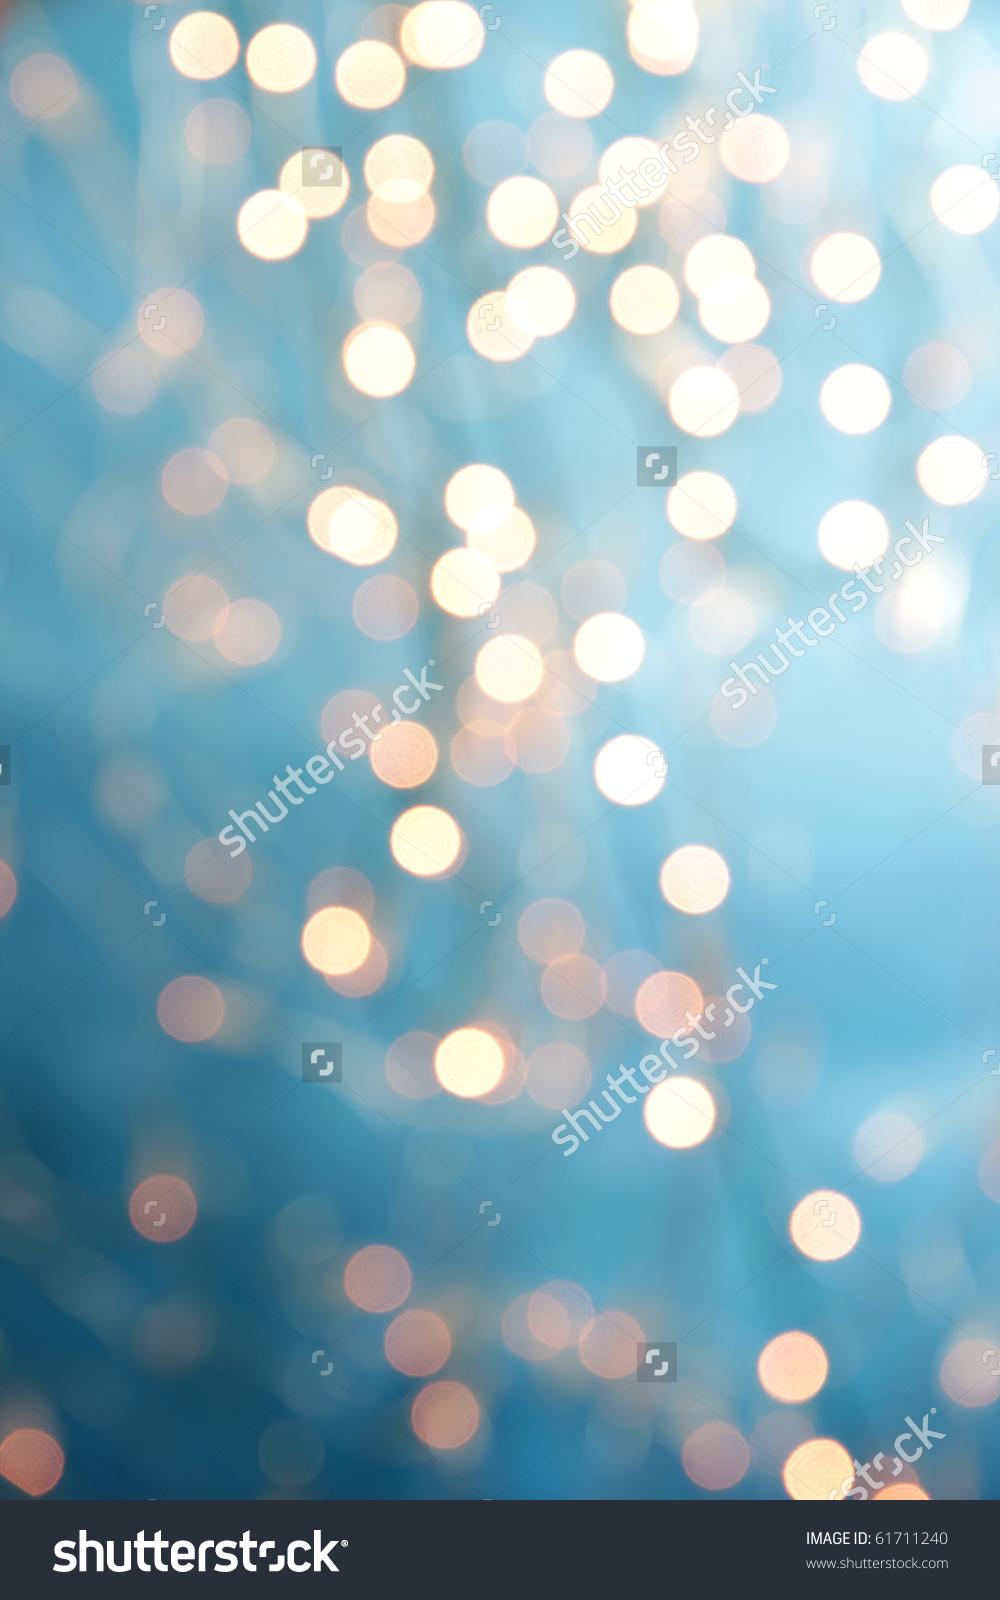 Shimmering Blur Background Shining Lights Stock Photo 61711240.